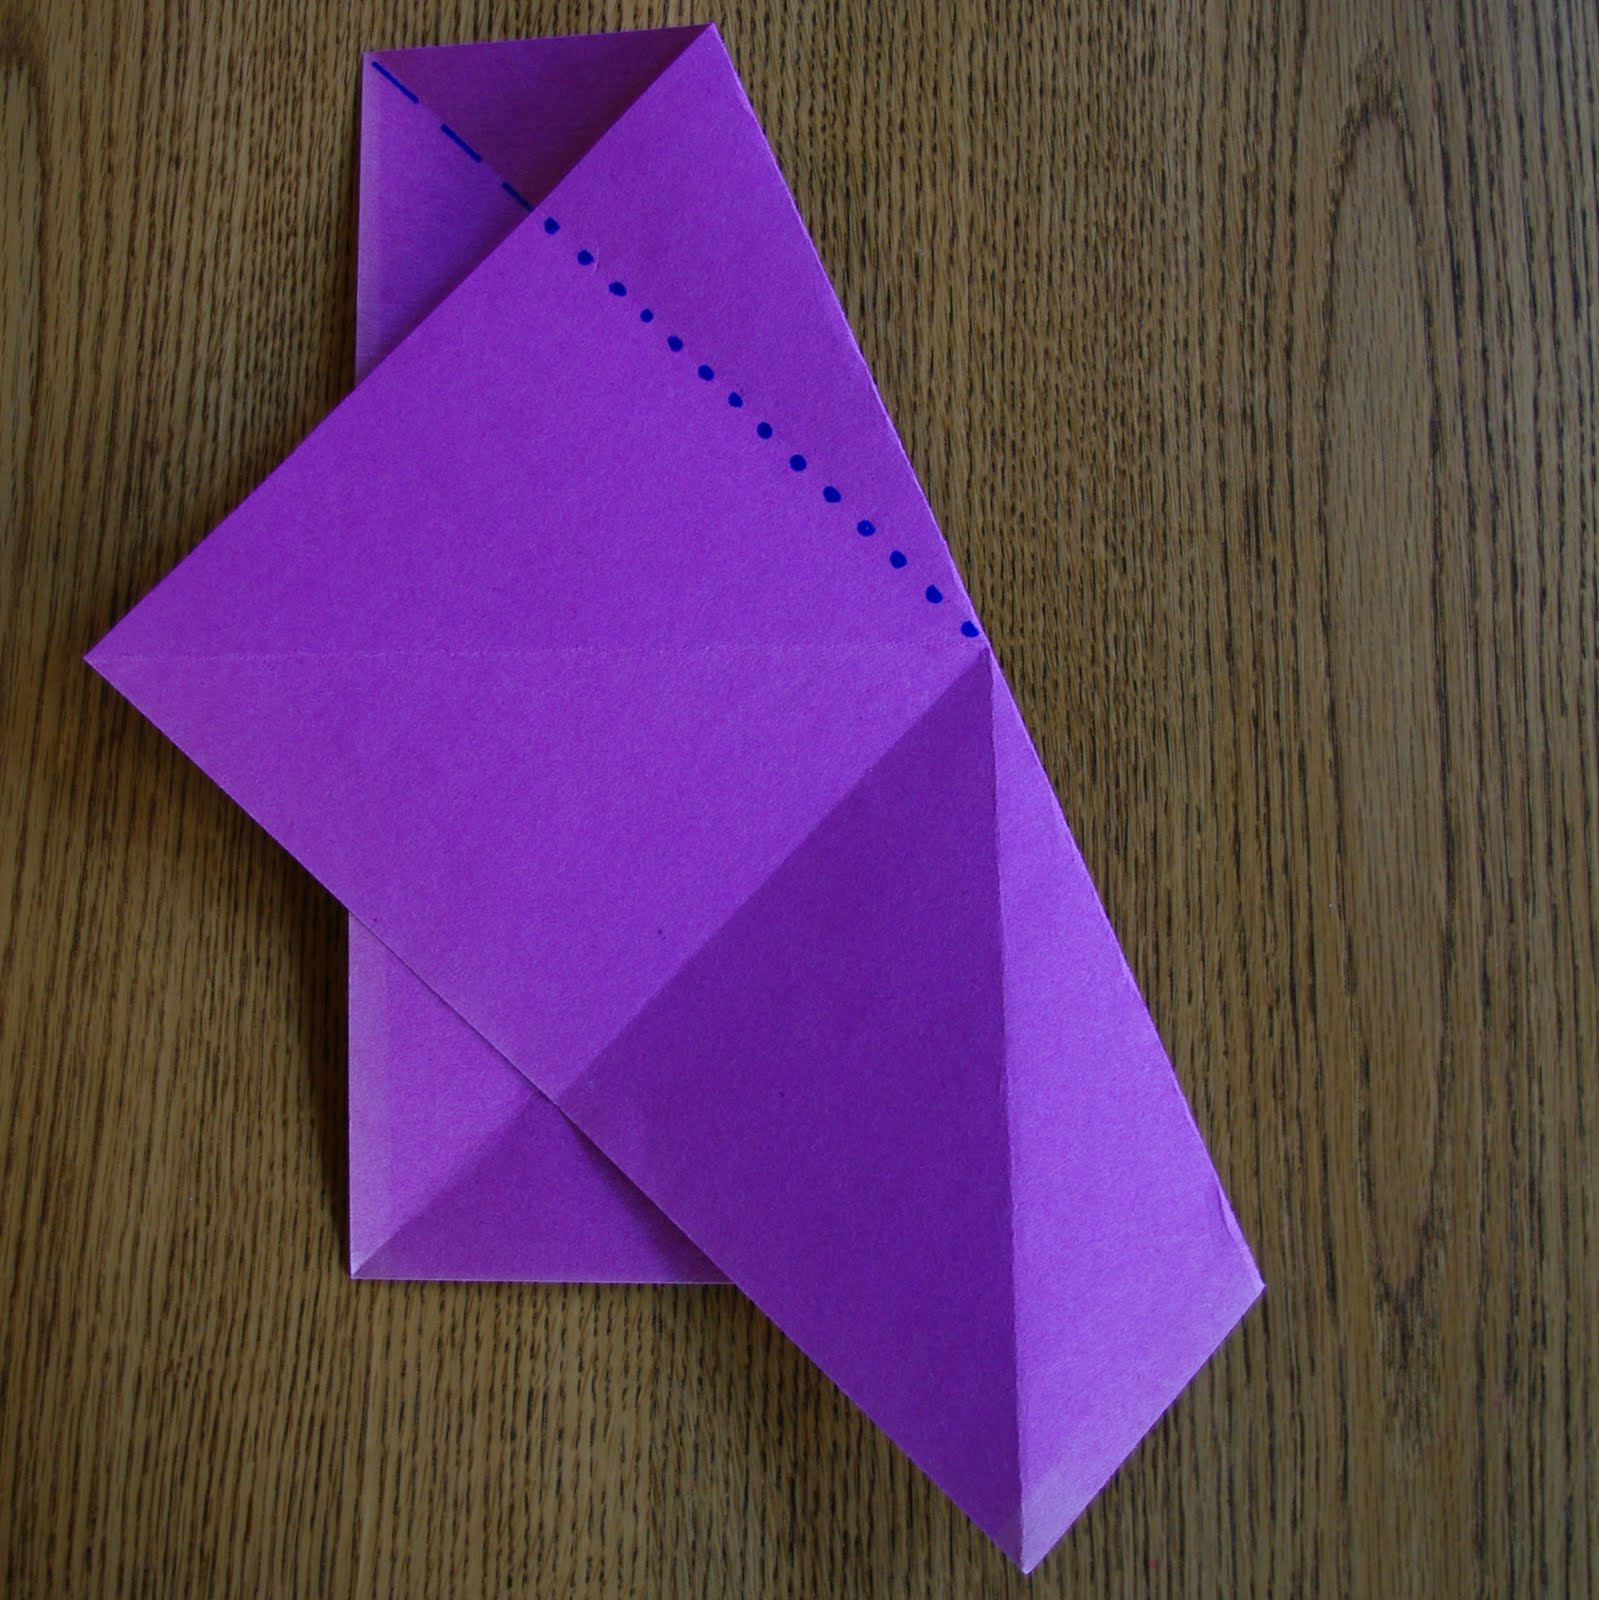 hanging Origami modern white paper pendant lamp/DIY handmade paper ...   1600x1599